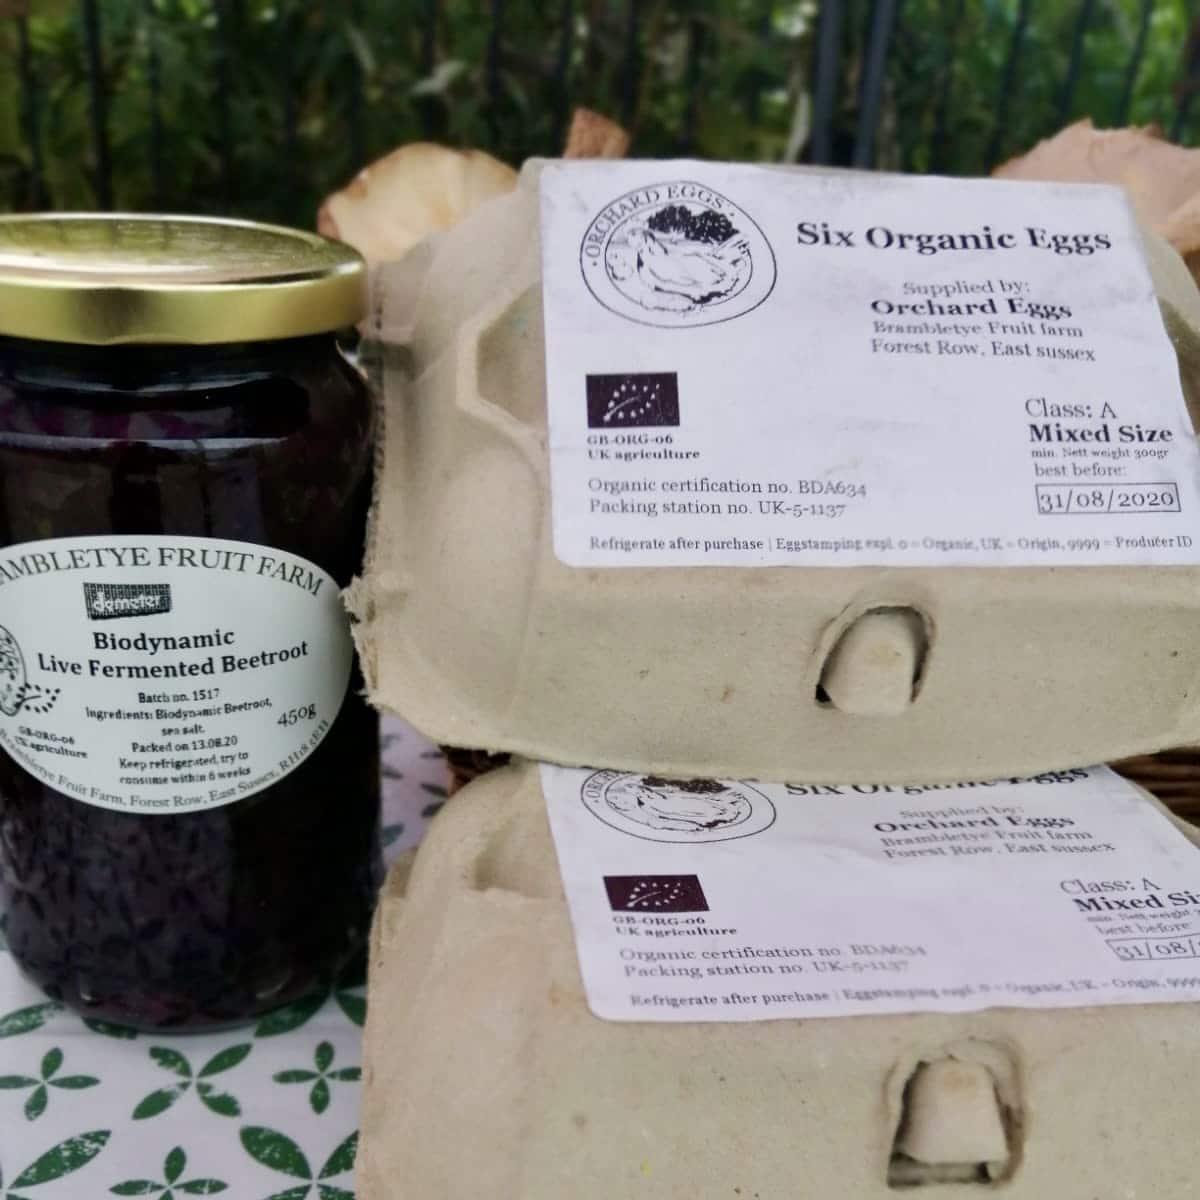 Eggs and fermented goods by Brambletye Fruit Farm